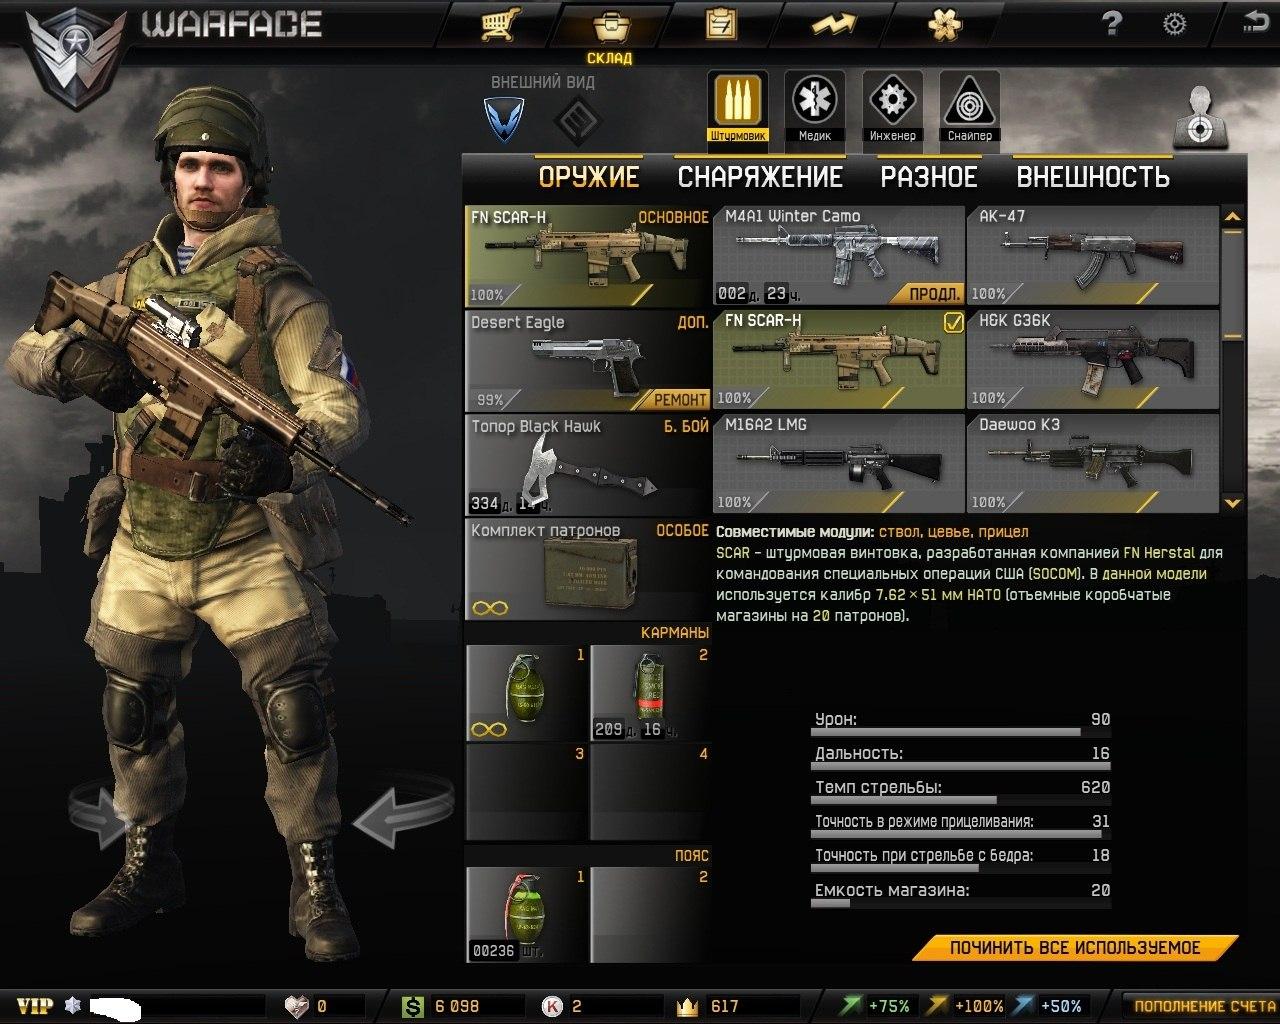 Warface - Многопользовательский онлайн-шутер 52